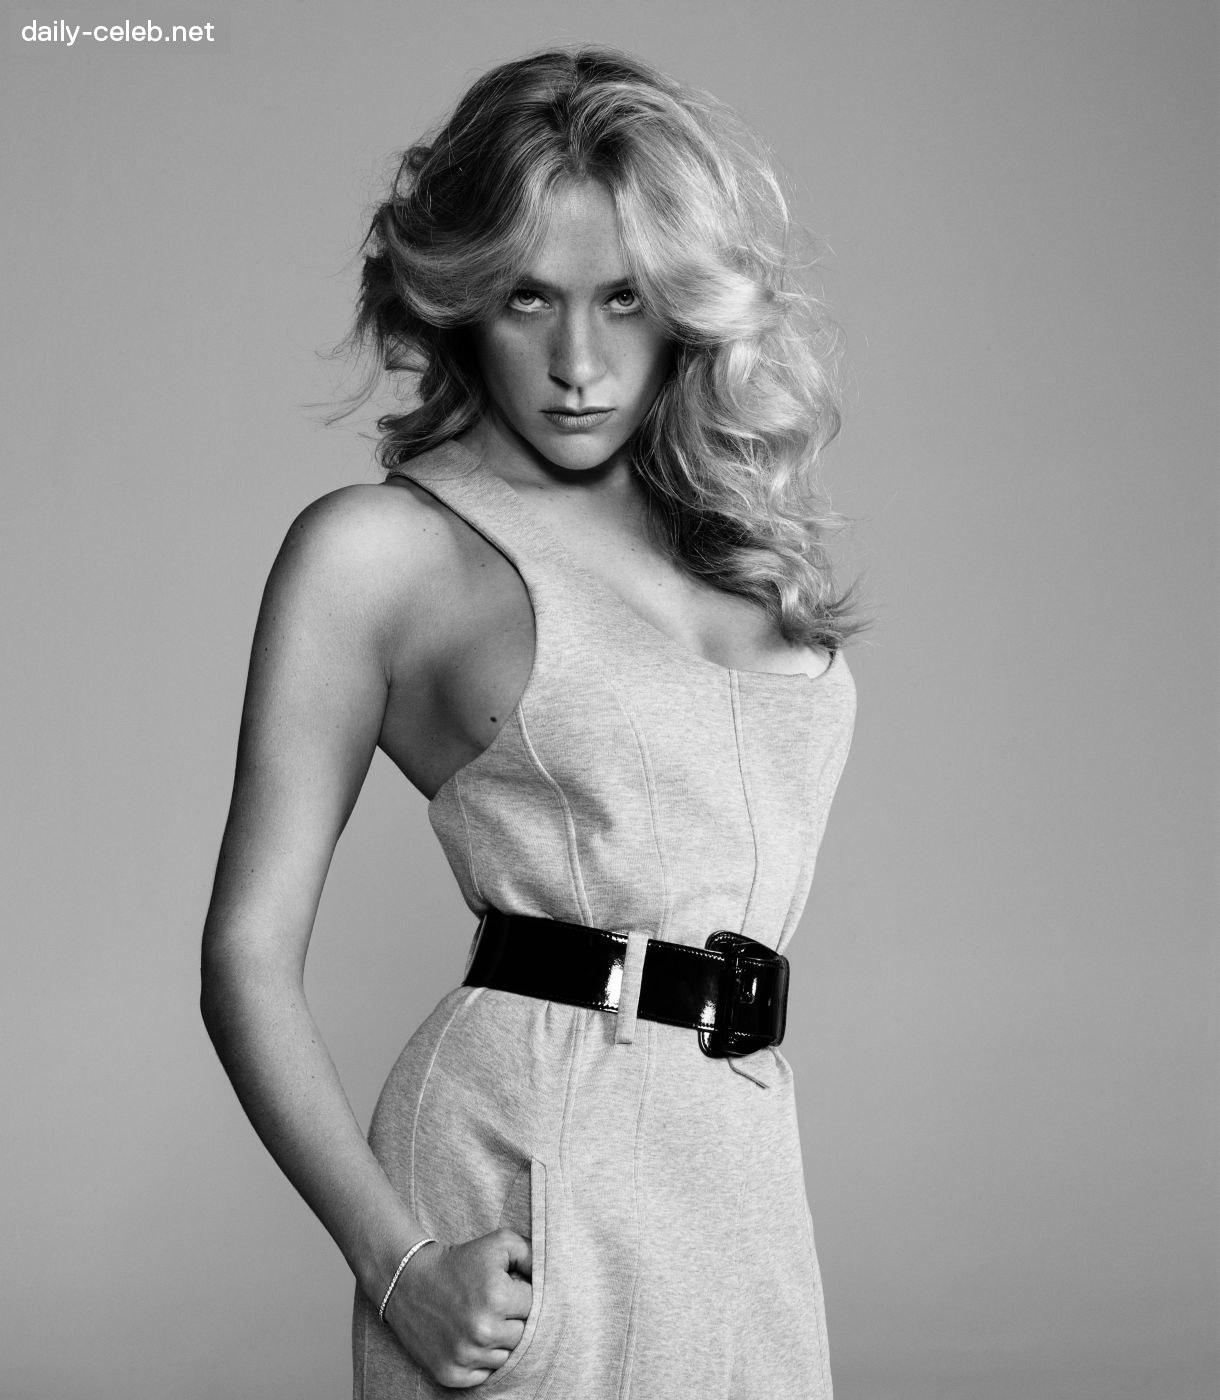 Actress/Model Chloe Sevigny | danklook™